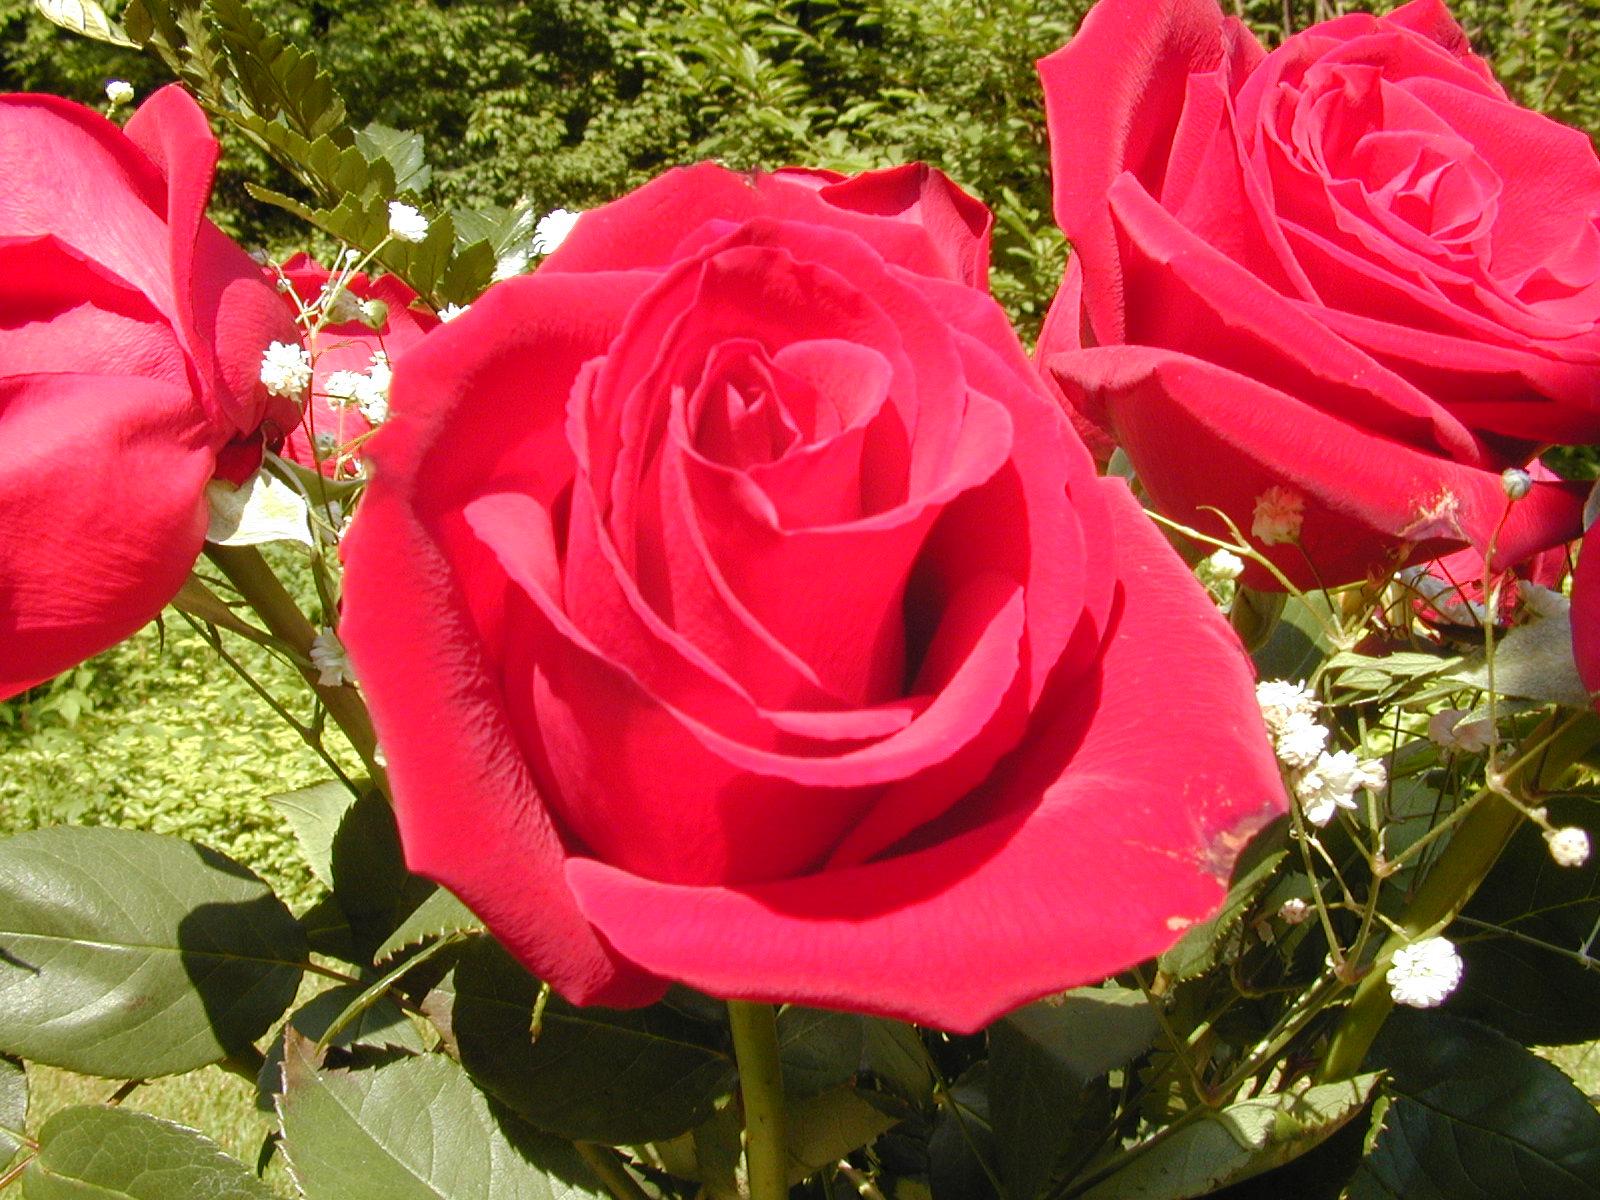 Gambar Gambar Bunga Mawar Yang Indah